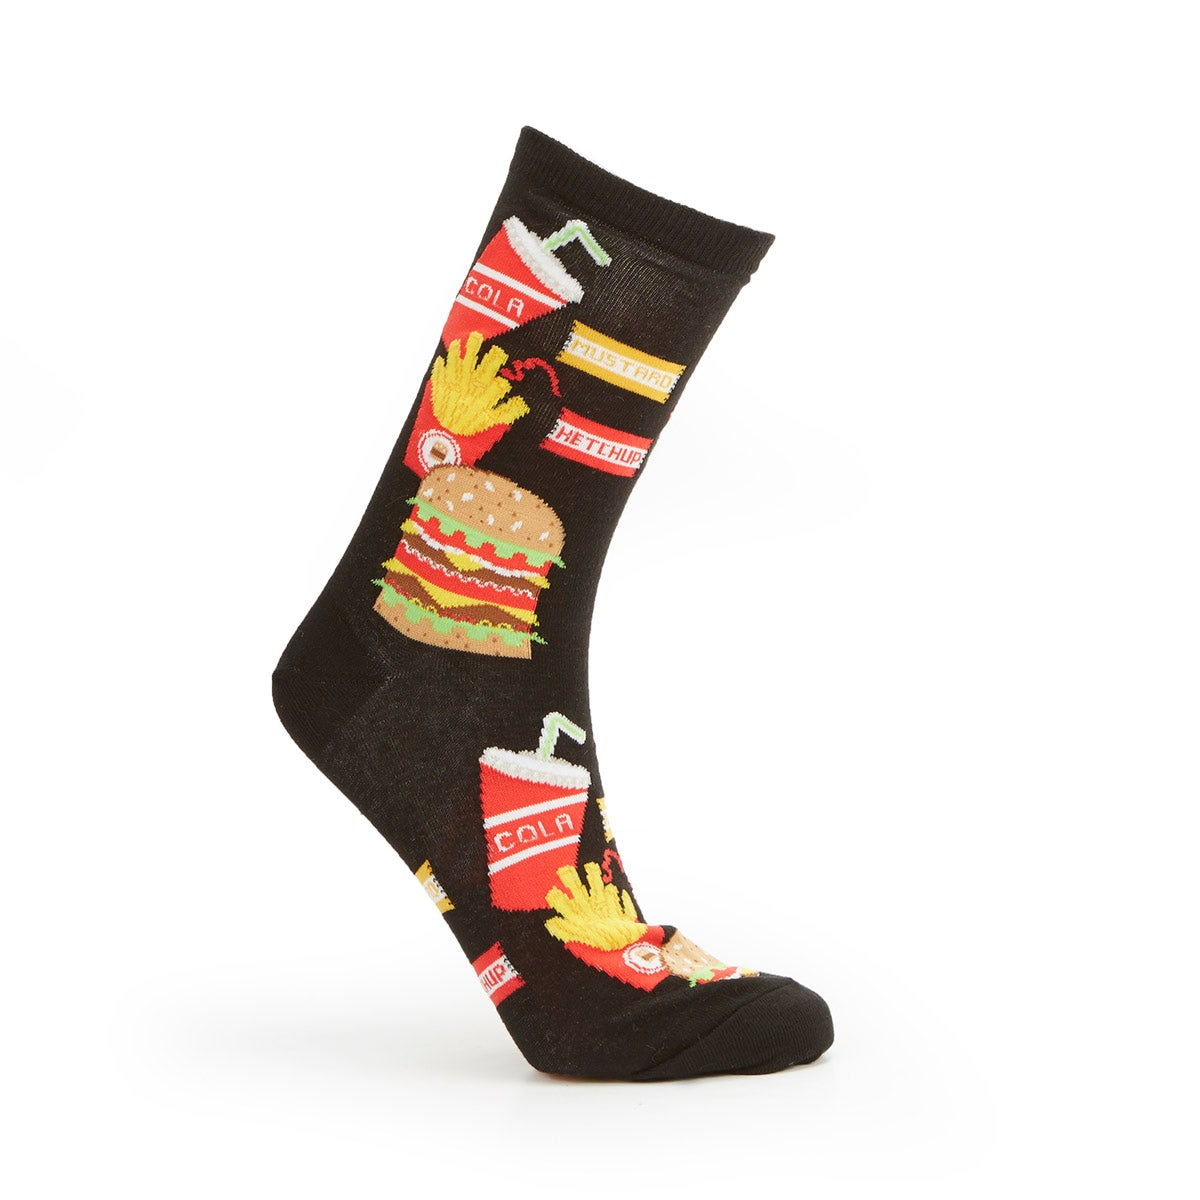 Lds Burger Fries& Drink blk printed sock